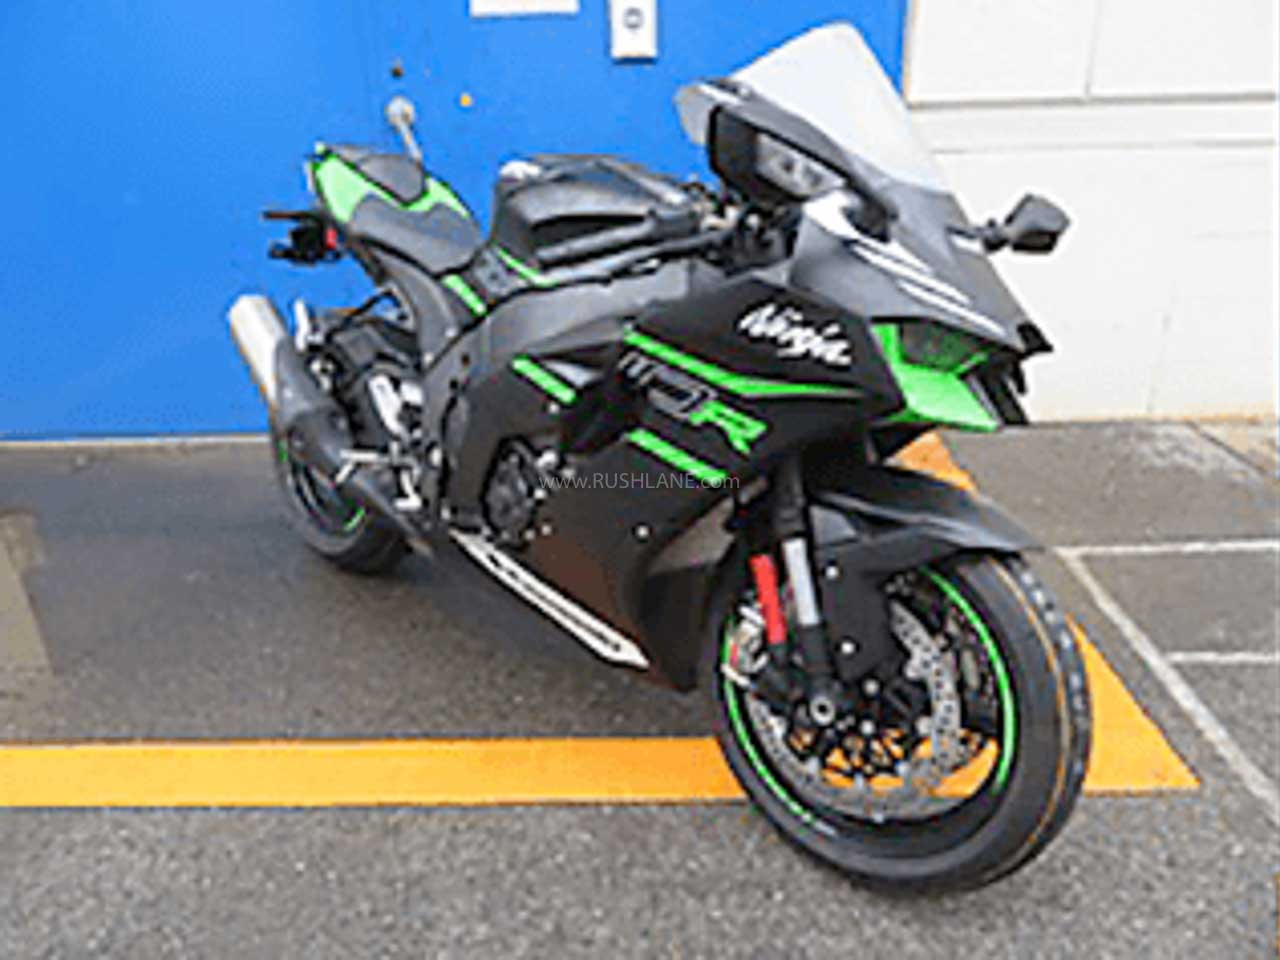 2021 Kawasaki Zx10r Zx10rr Spied Ahead Of Global Debut